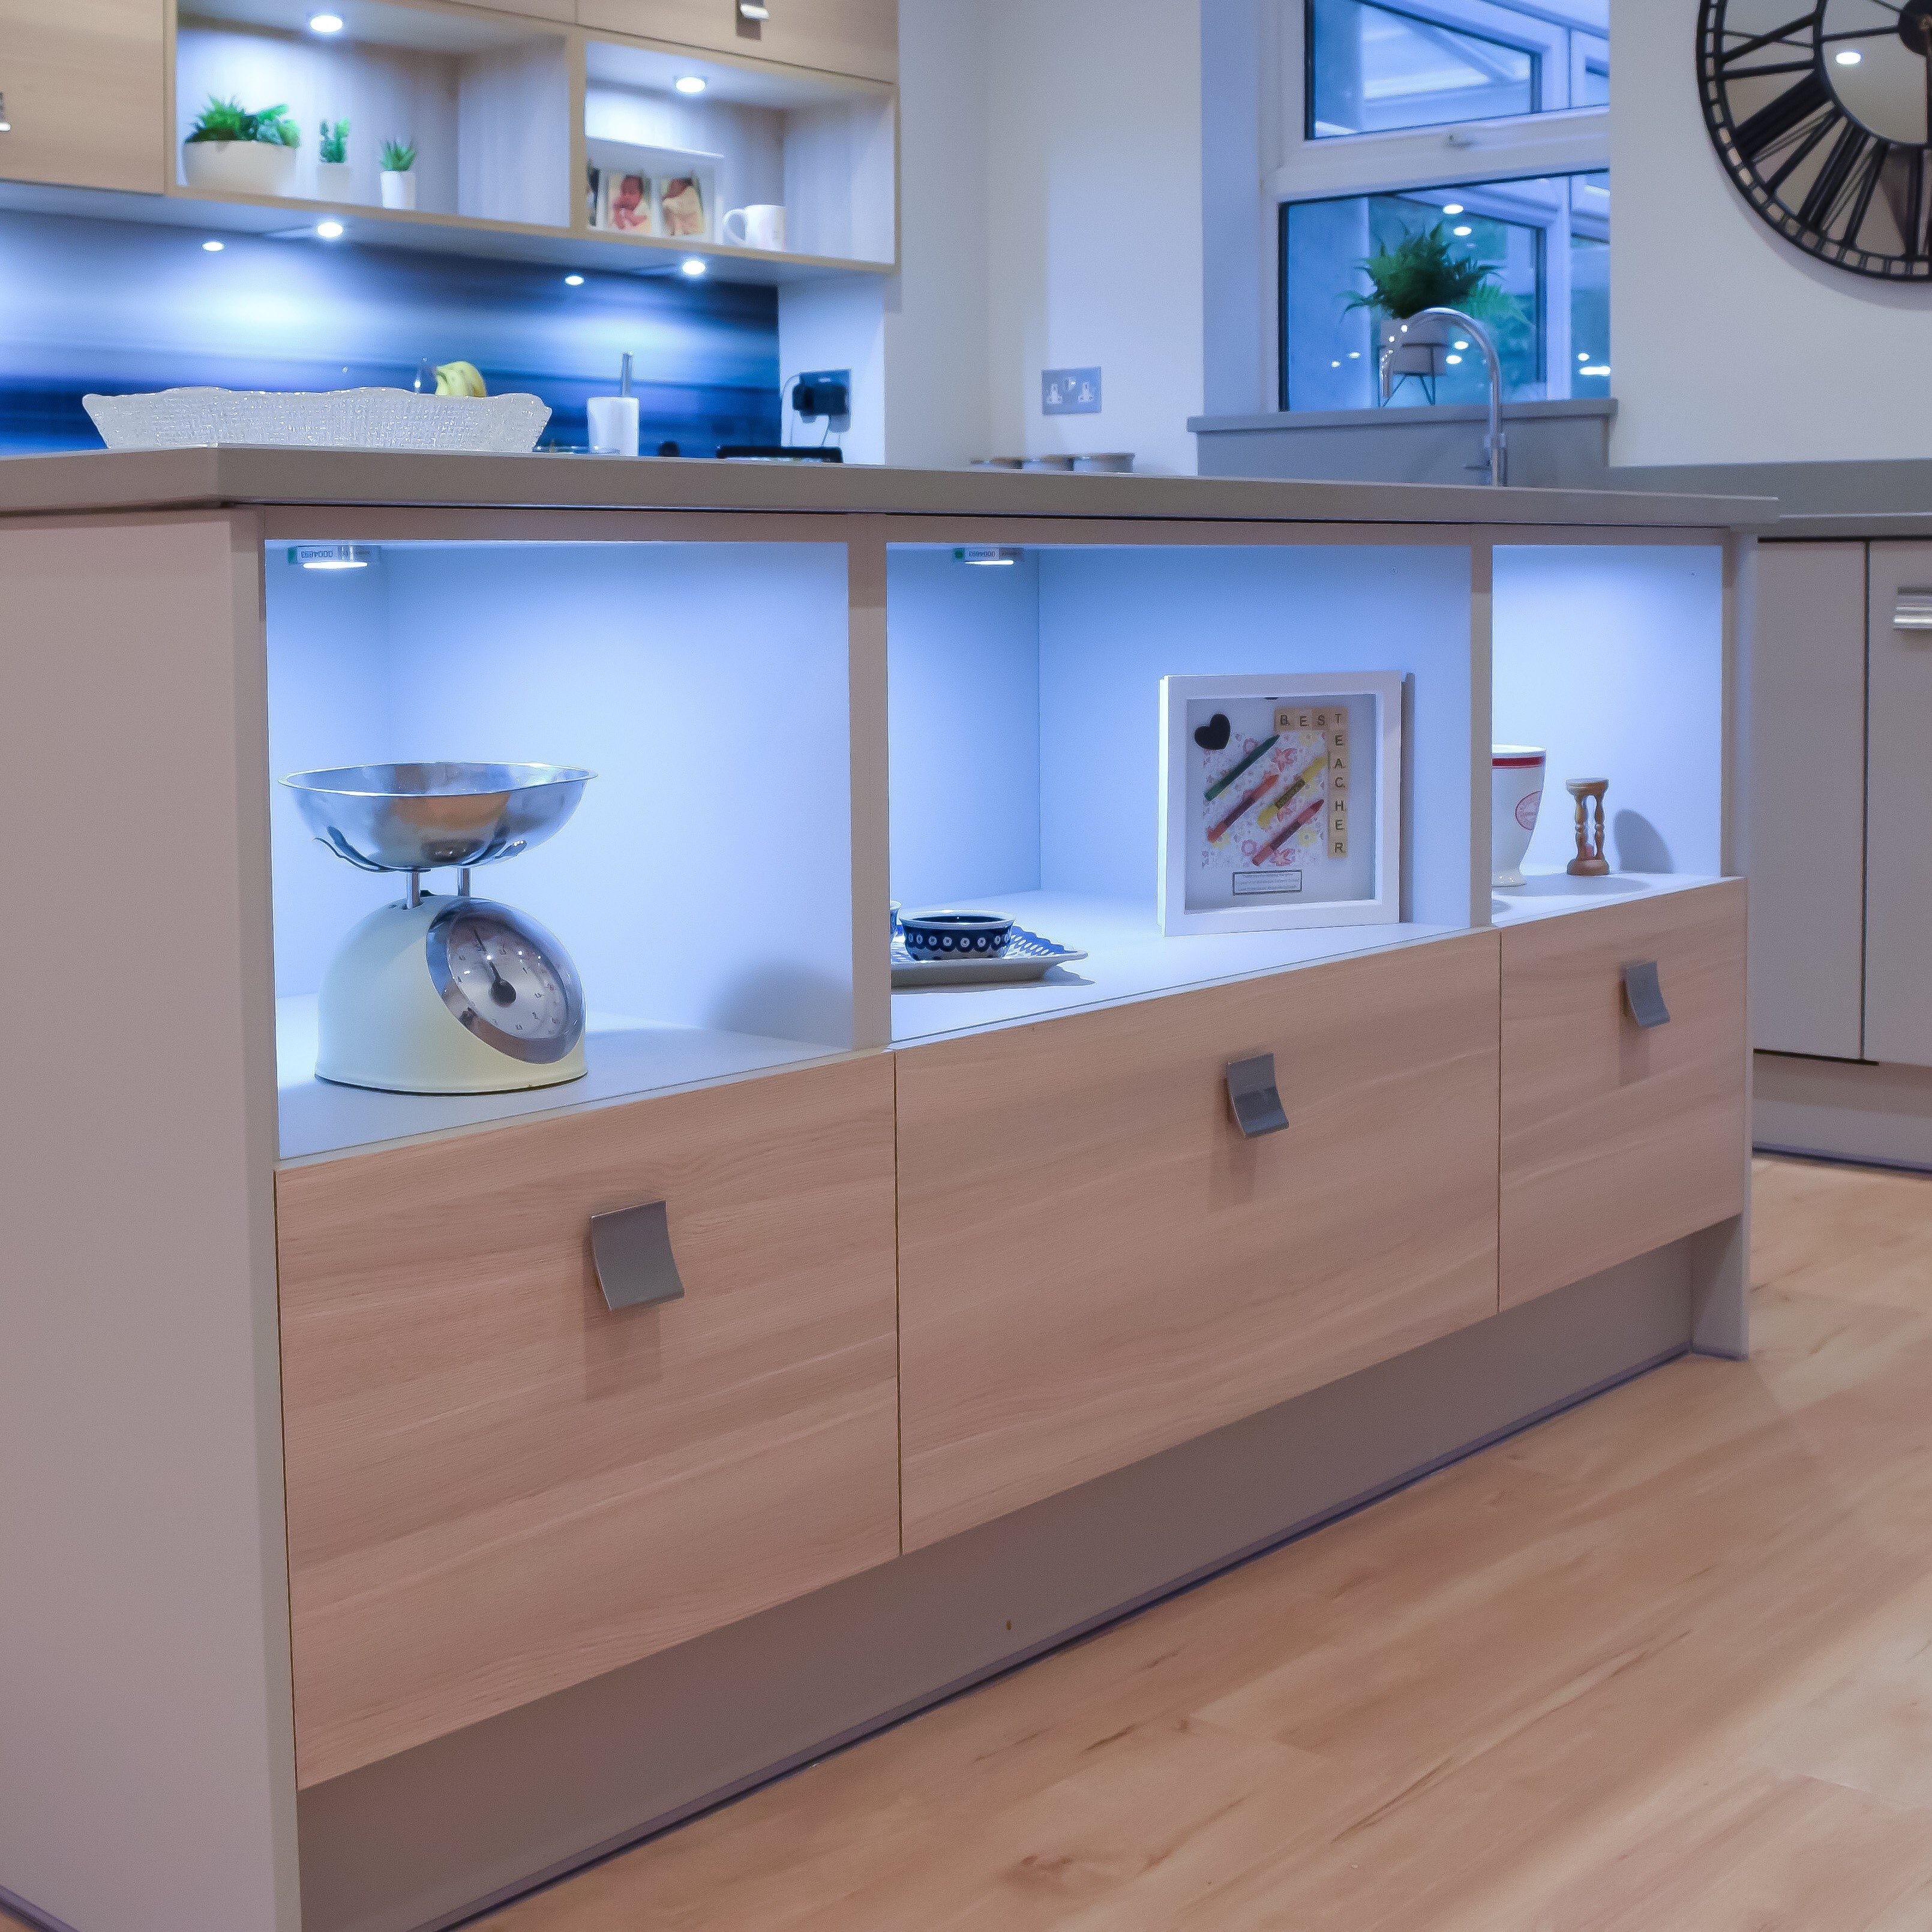 Southampton Kitchen-dining room